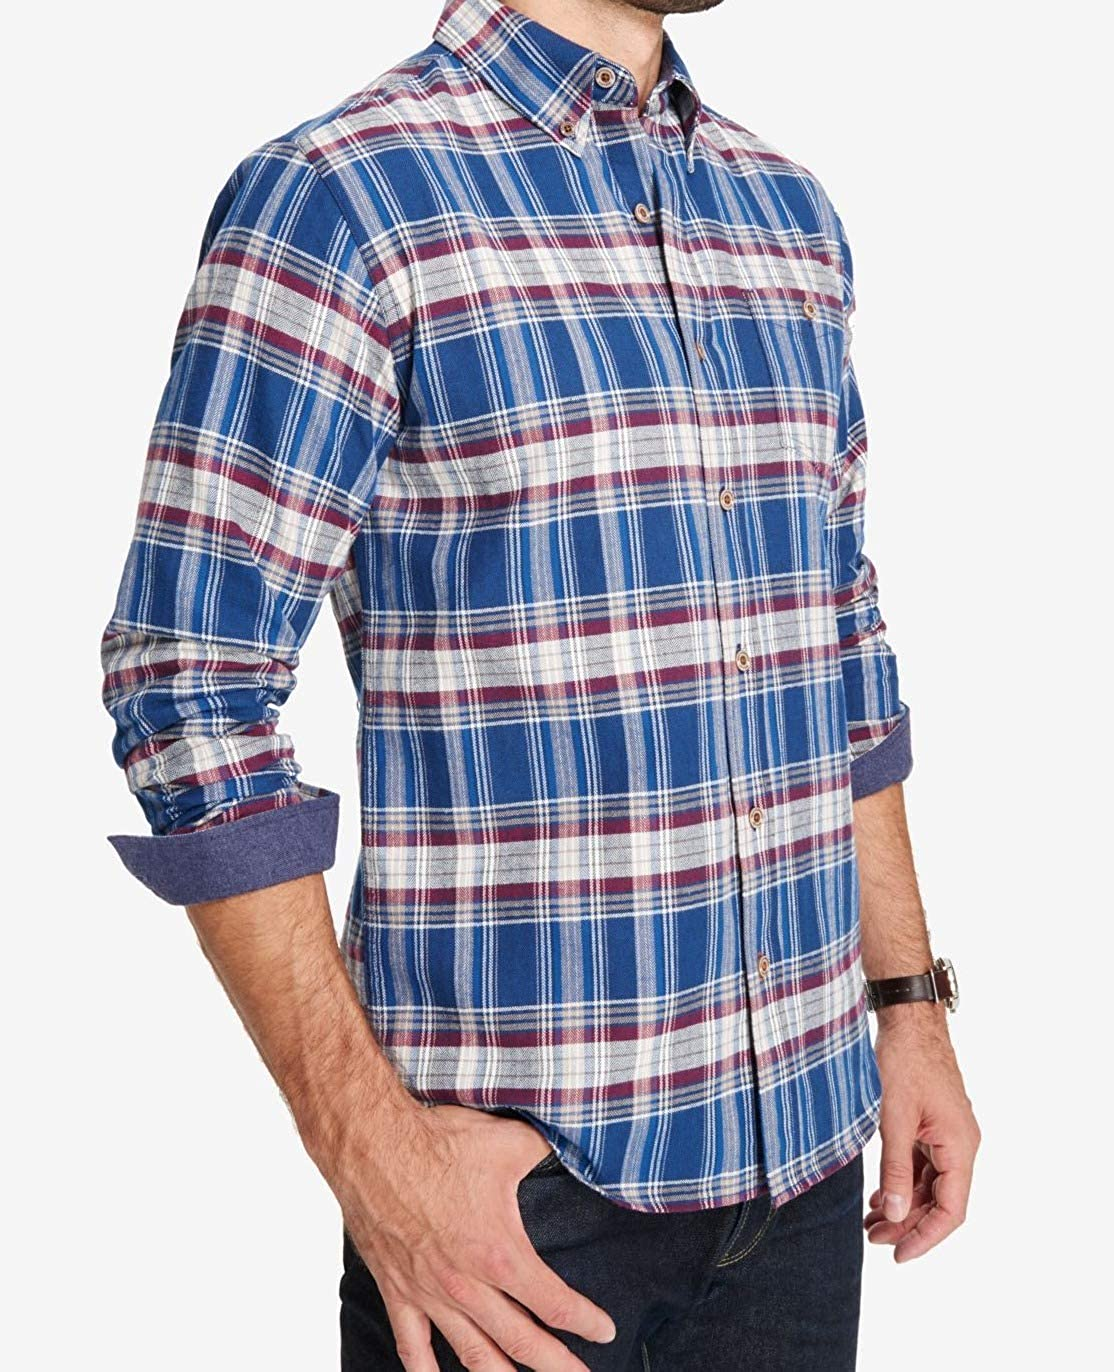 Storm, X-Large Mens Plaid Button Up Long Sleeve Shirt